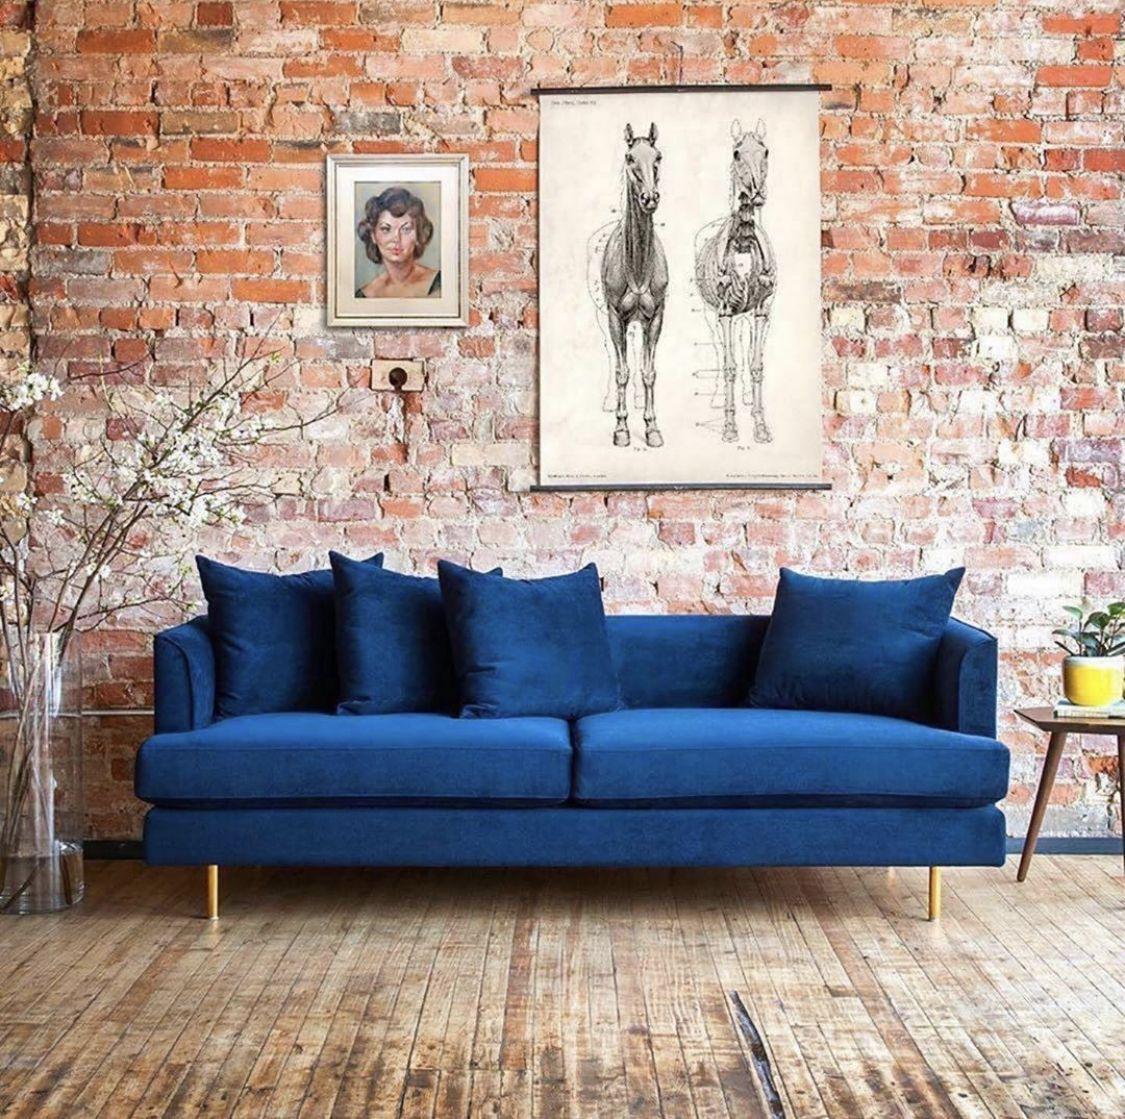 20 Off Gus Modern In 2020 Best Online Furniture Stores Home Decor Black Furniture Living Room